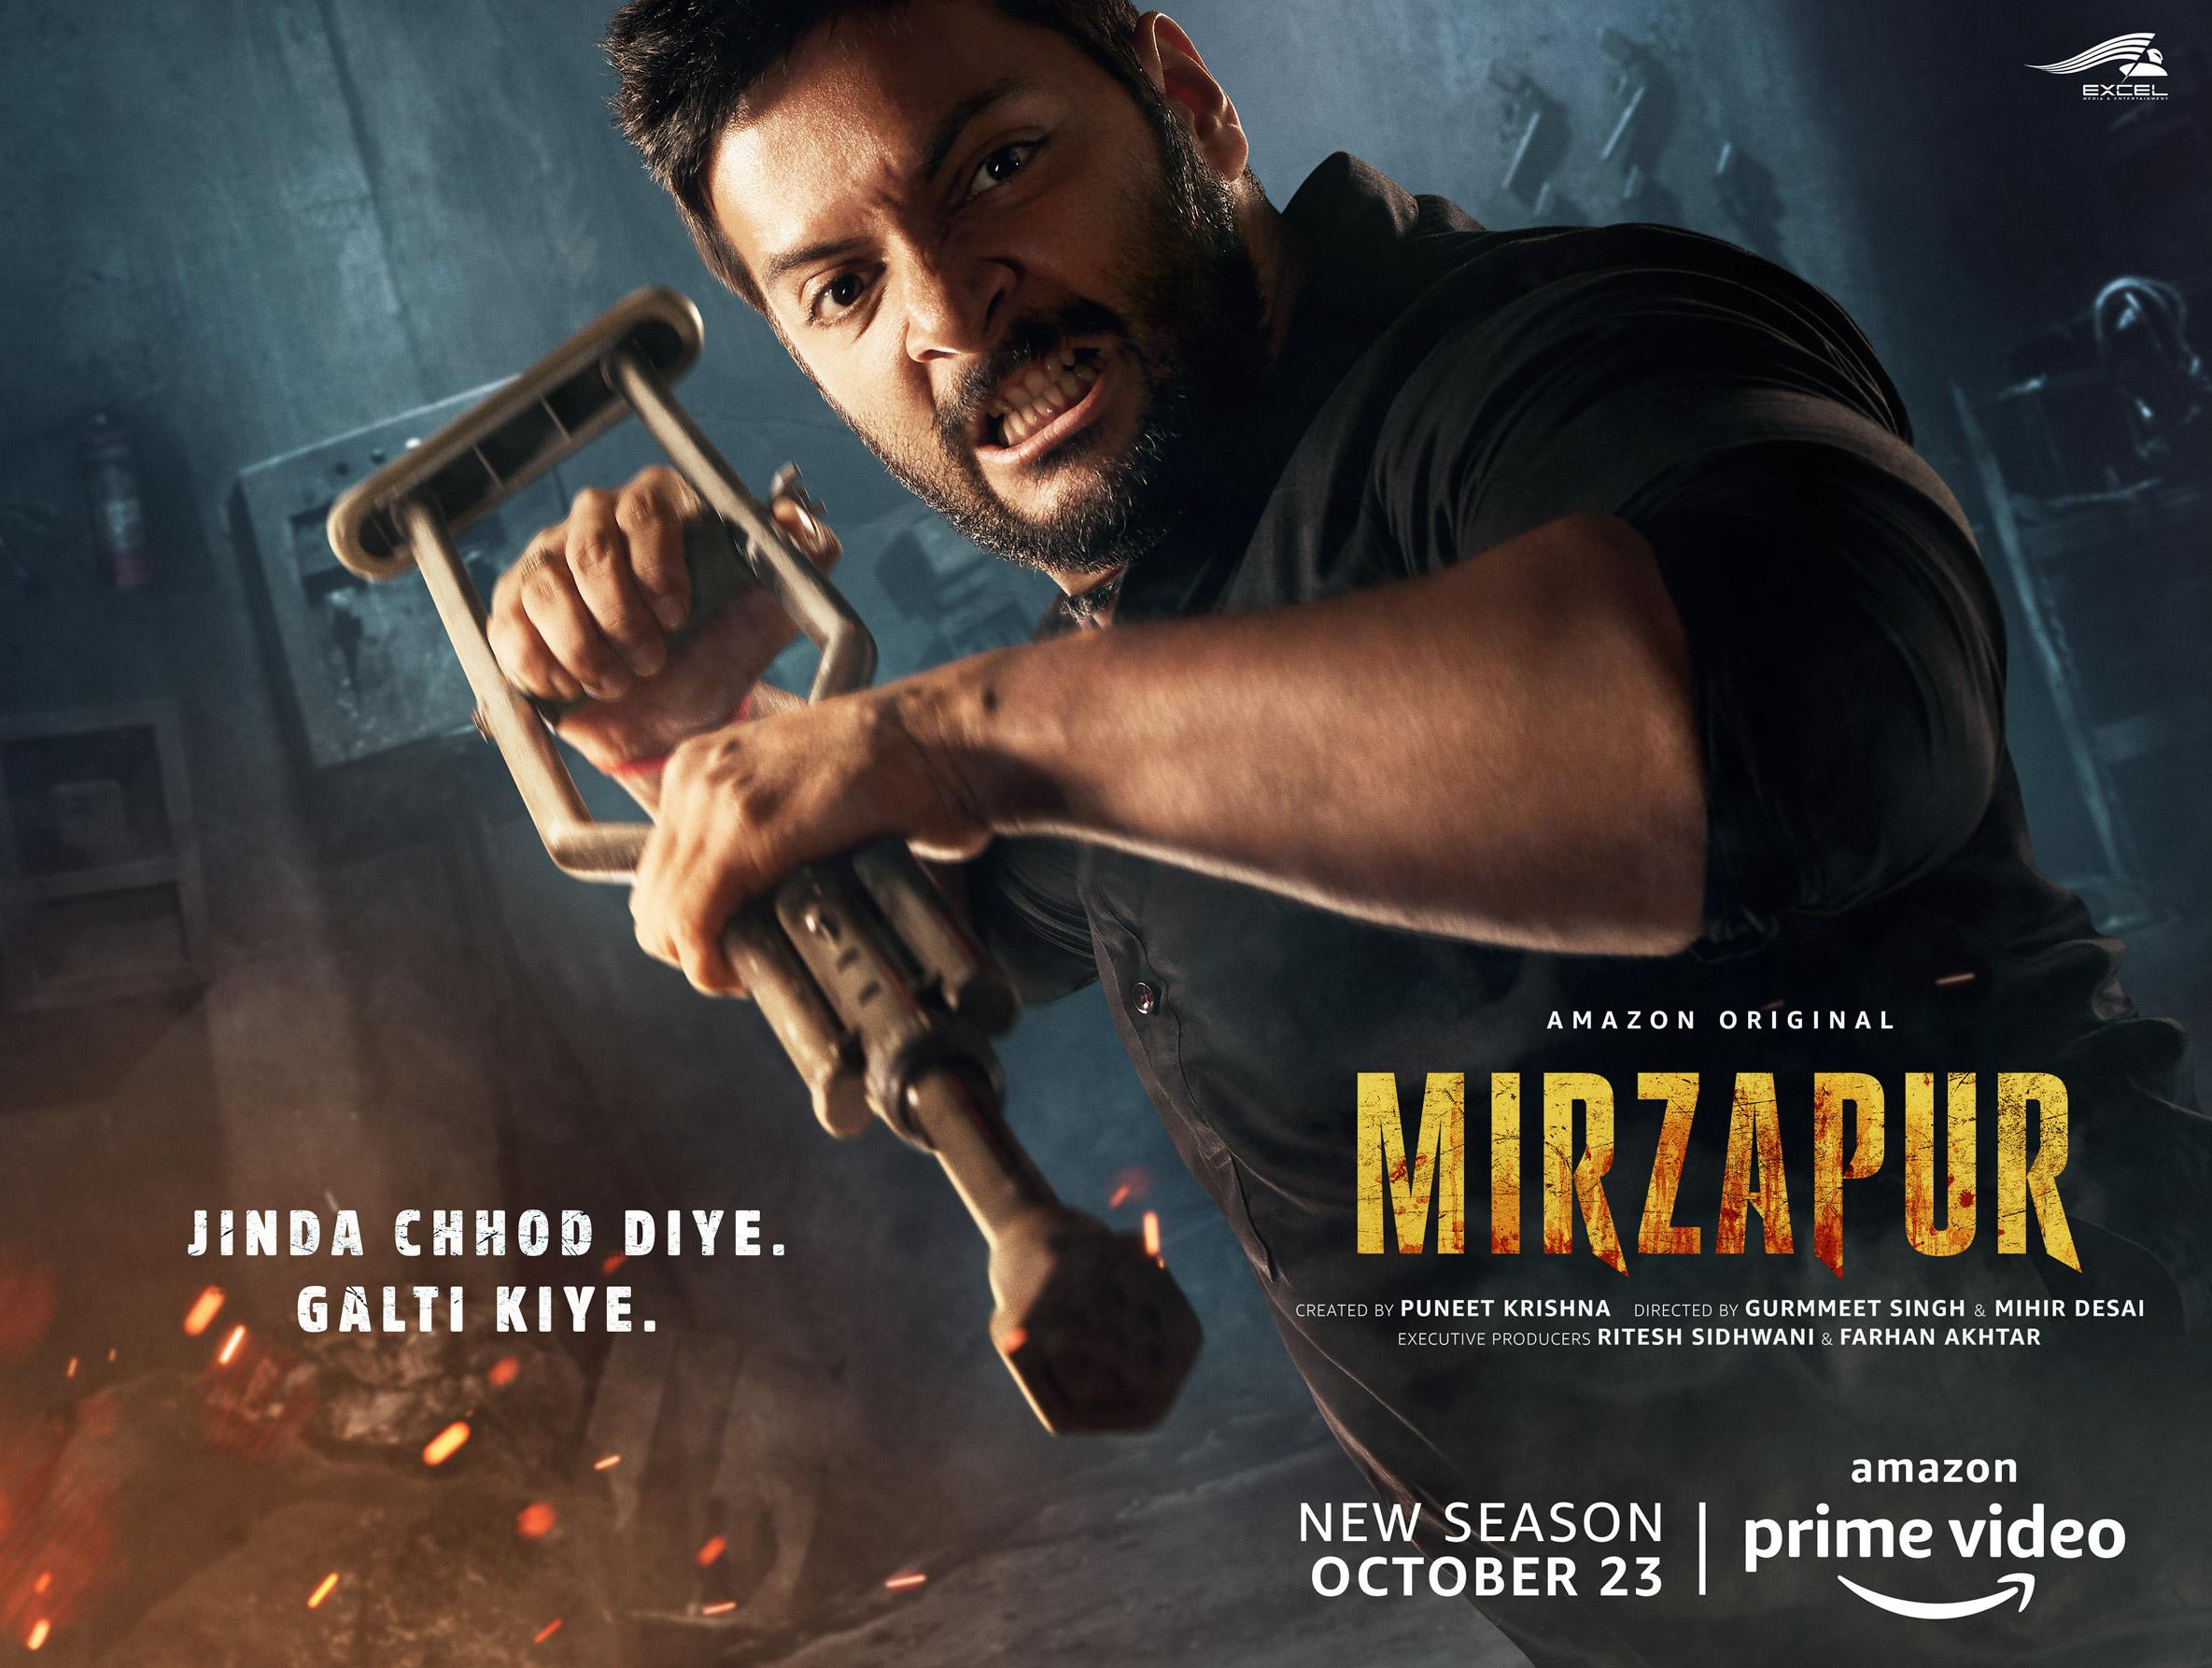 Mirzapur Season 3 renewed, Ali Fazal talks on Guddu, what latest we know